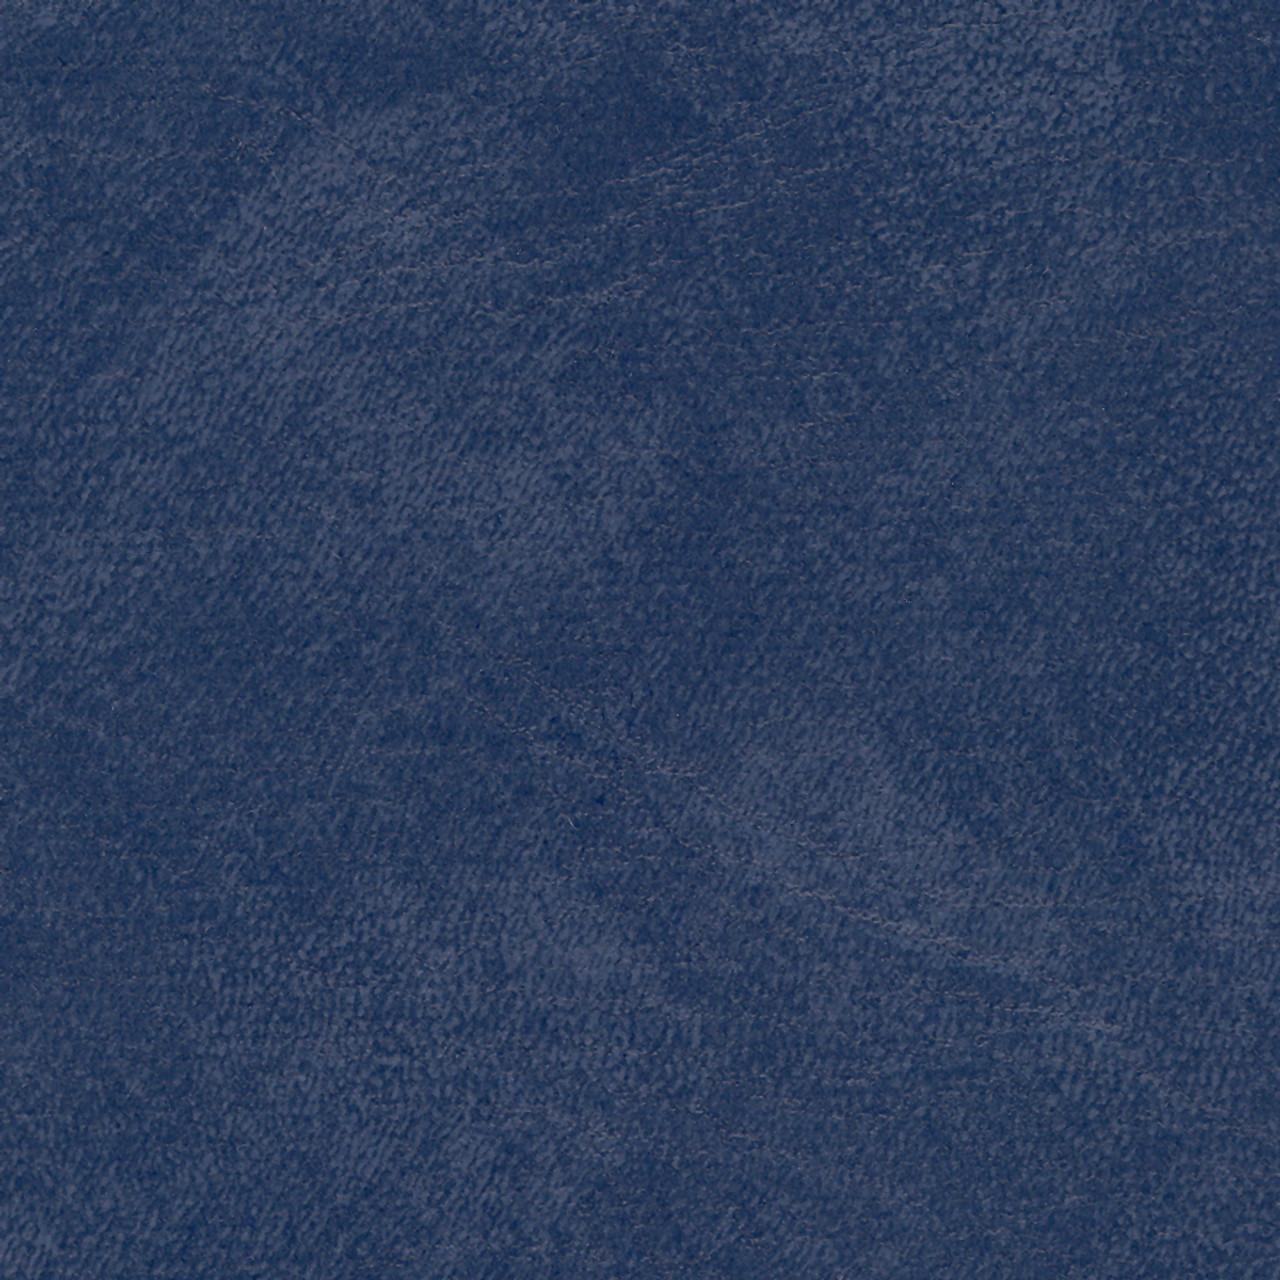 Seabreeze SEA-857 Blue Marlin